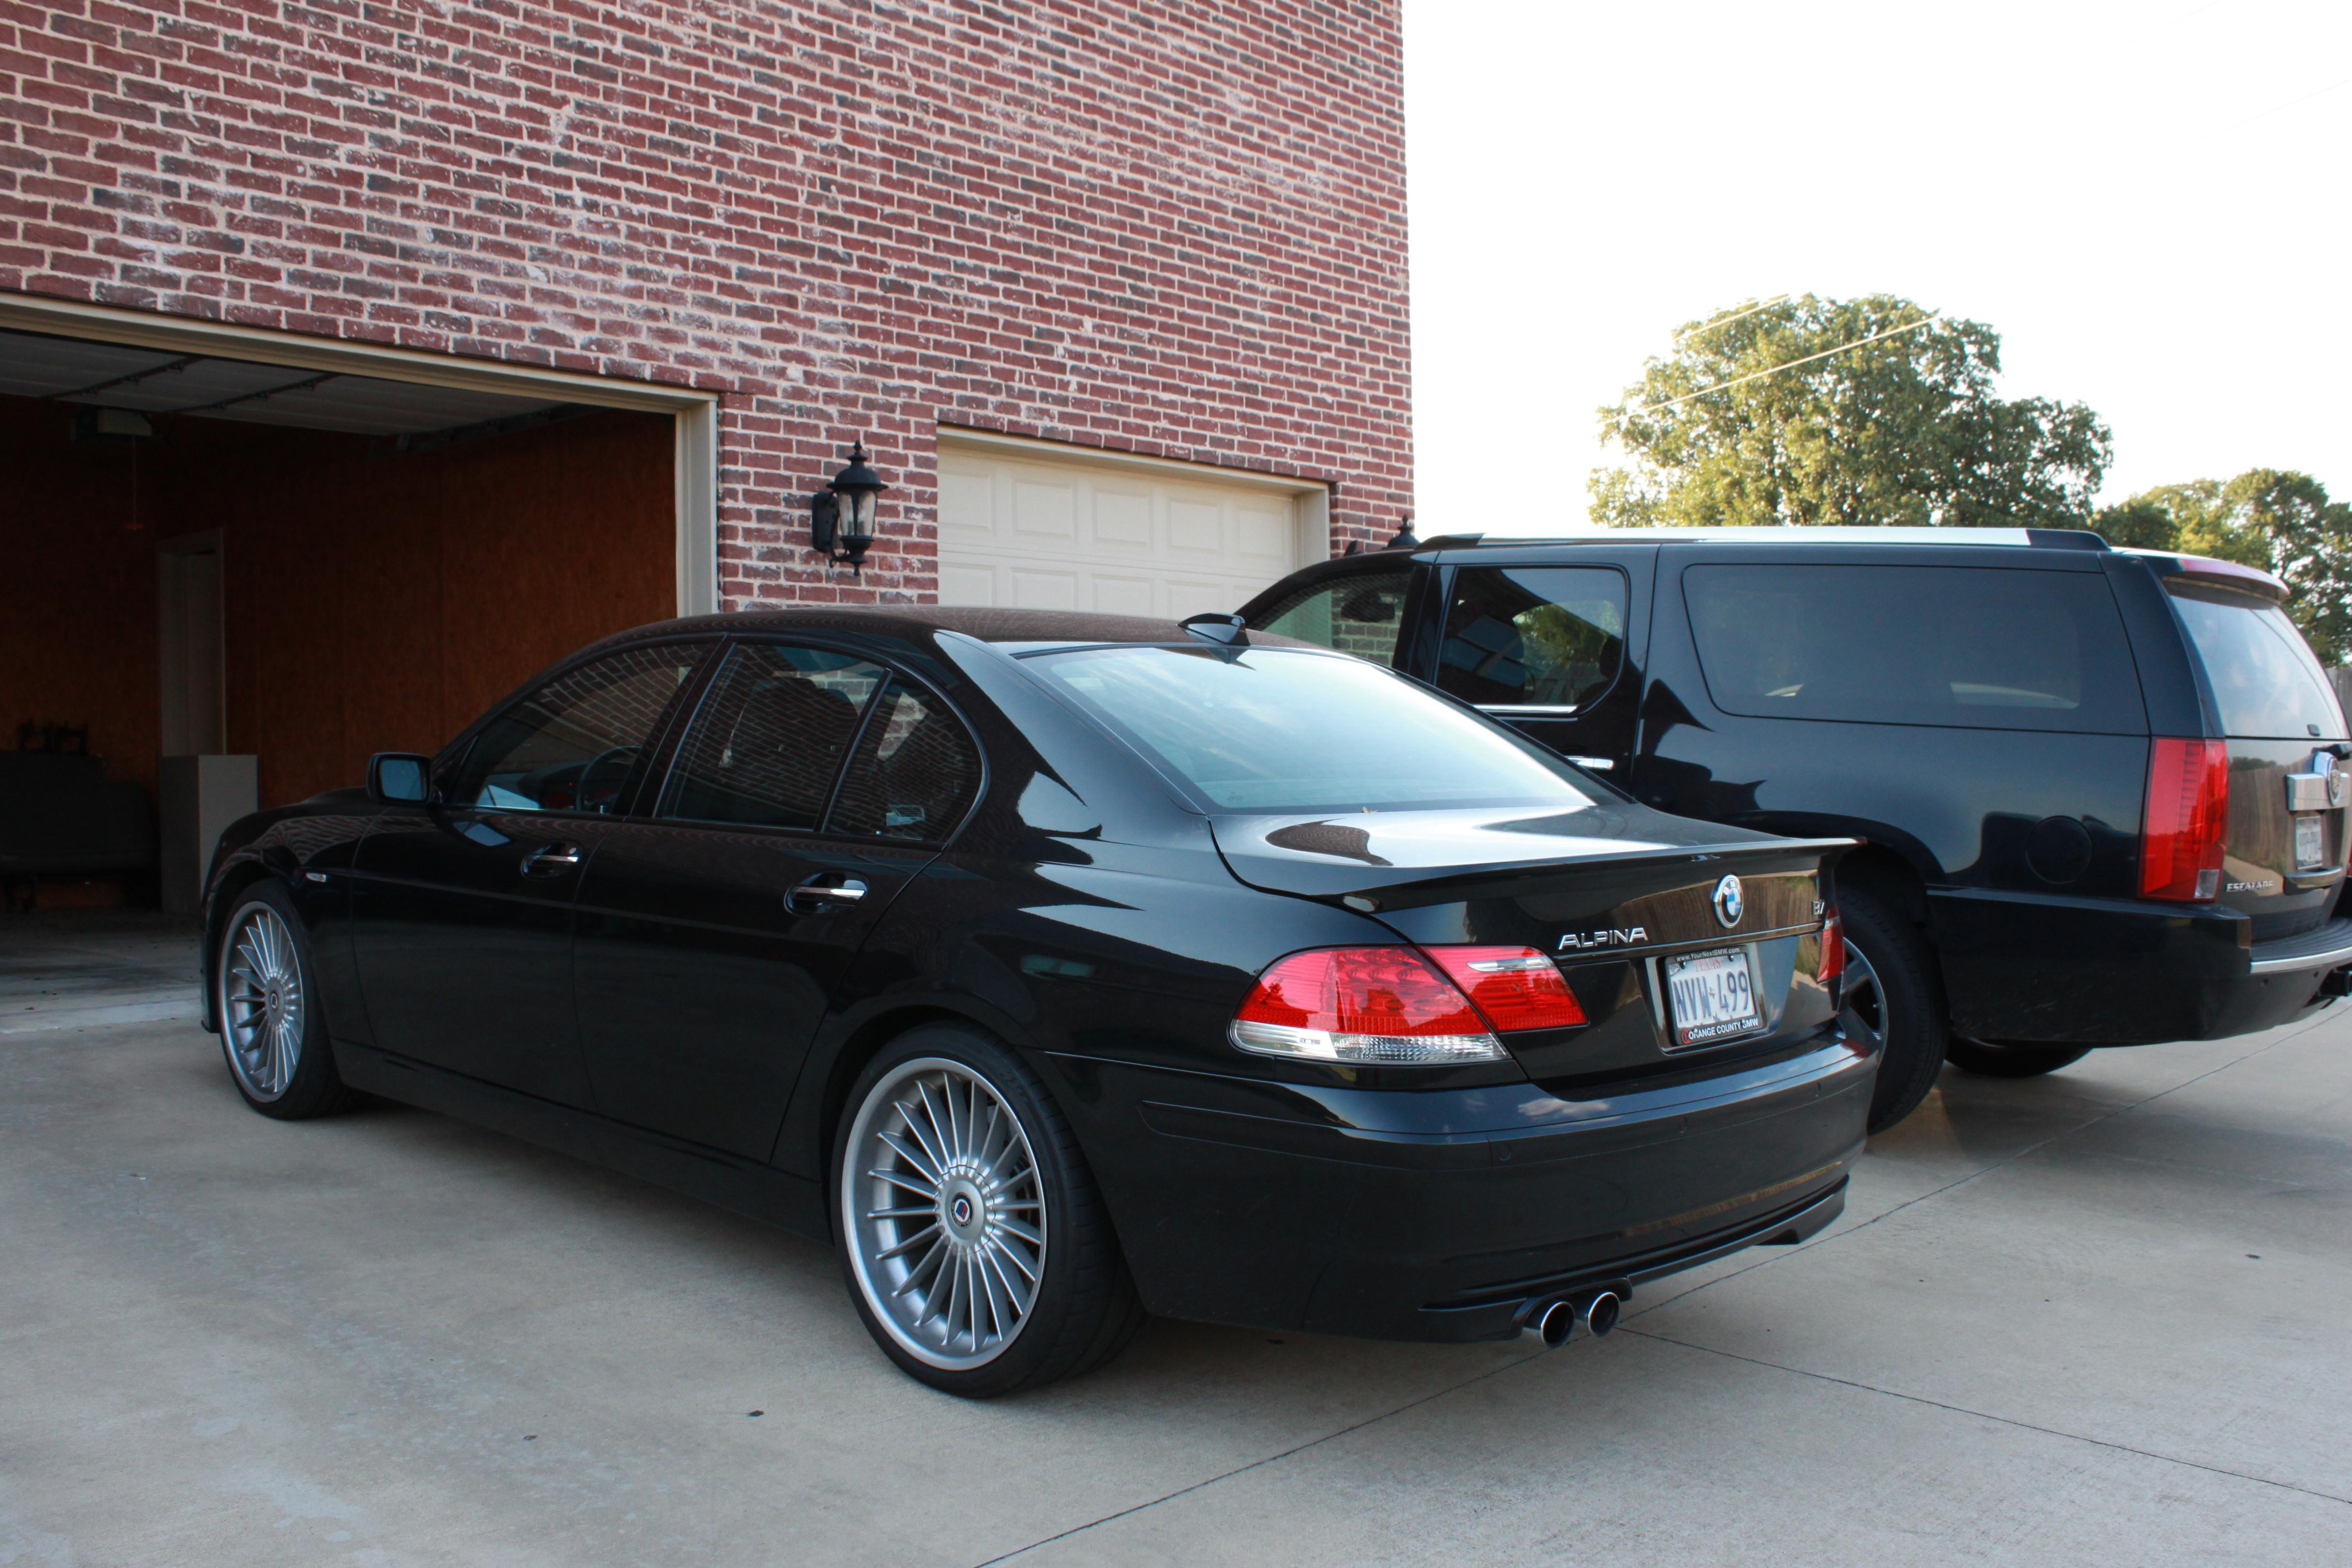 Member Sarj521 nice garage: BMW M5 E60 and BMW ALPINA B7 - BMW M5 ...